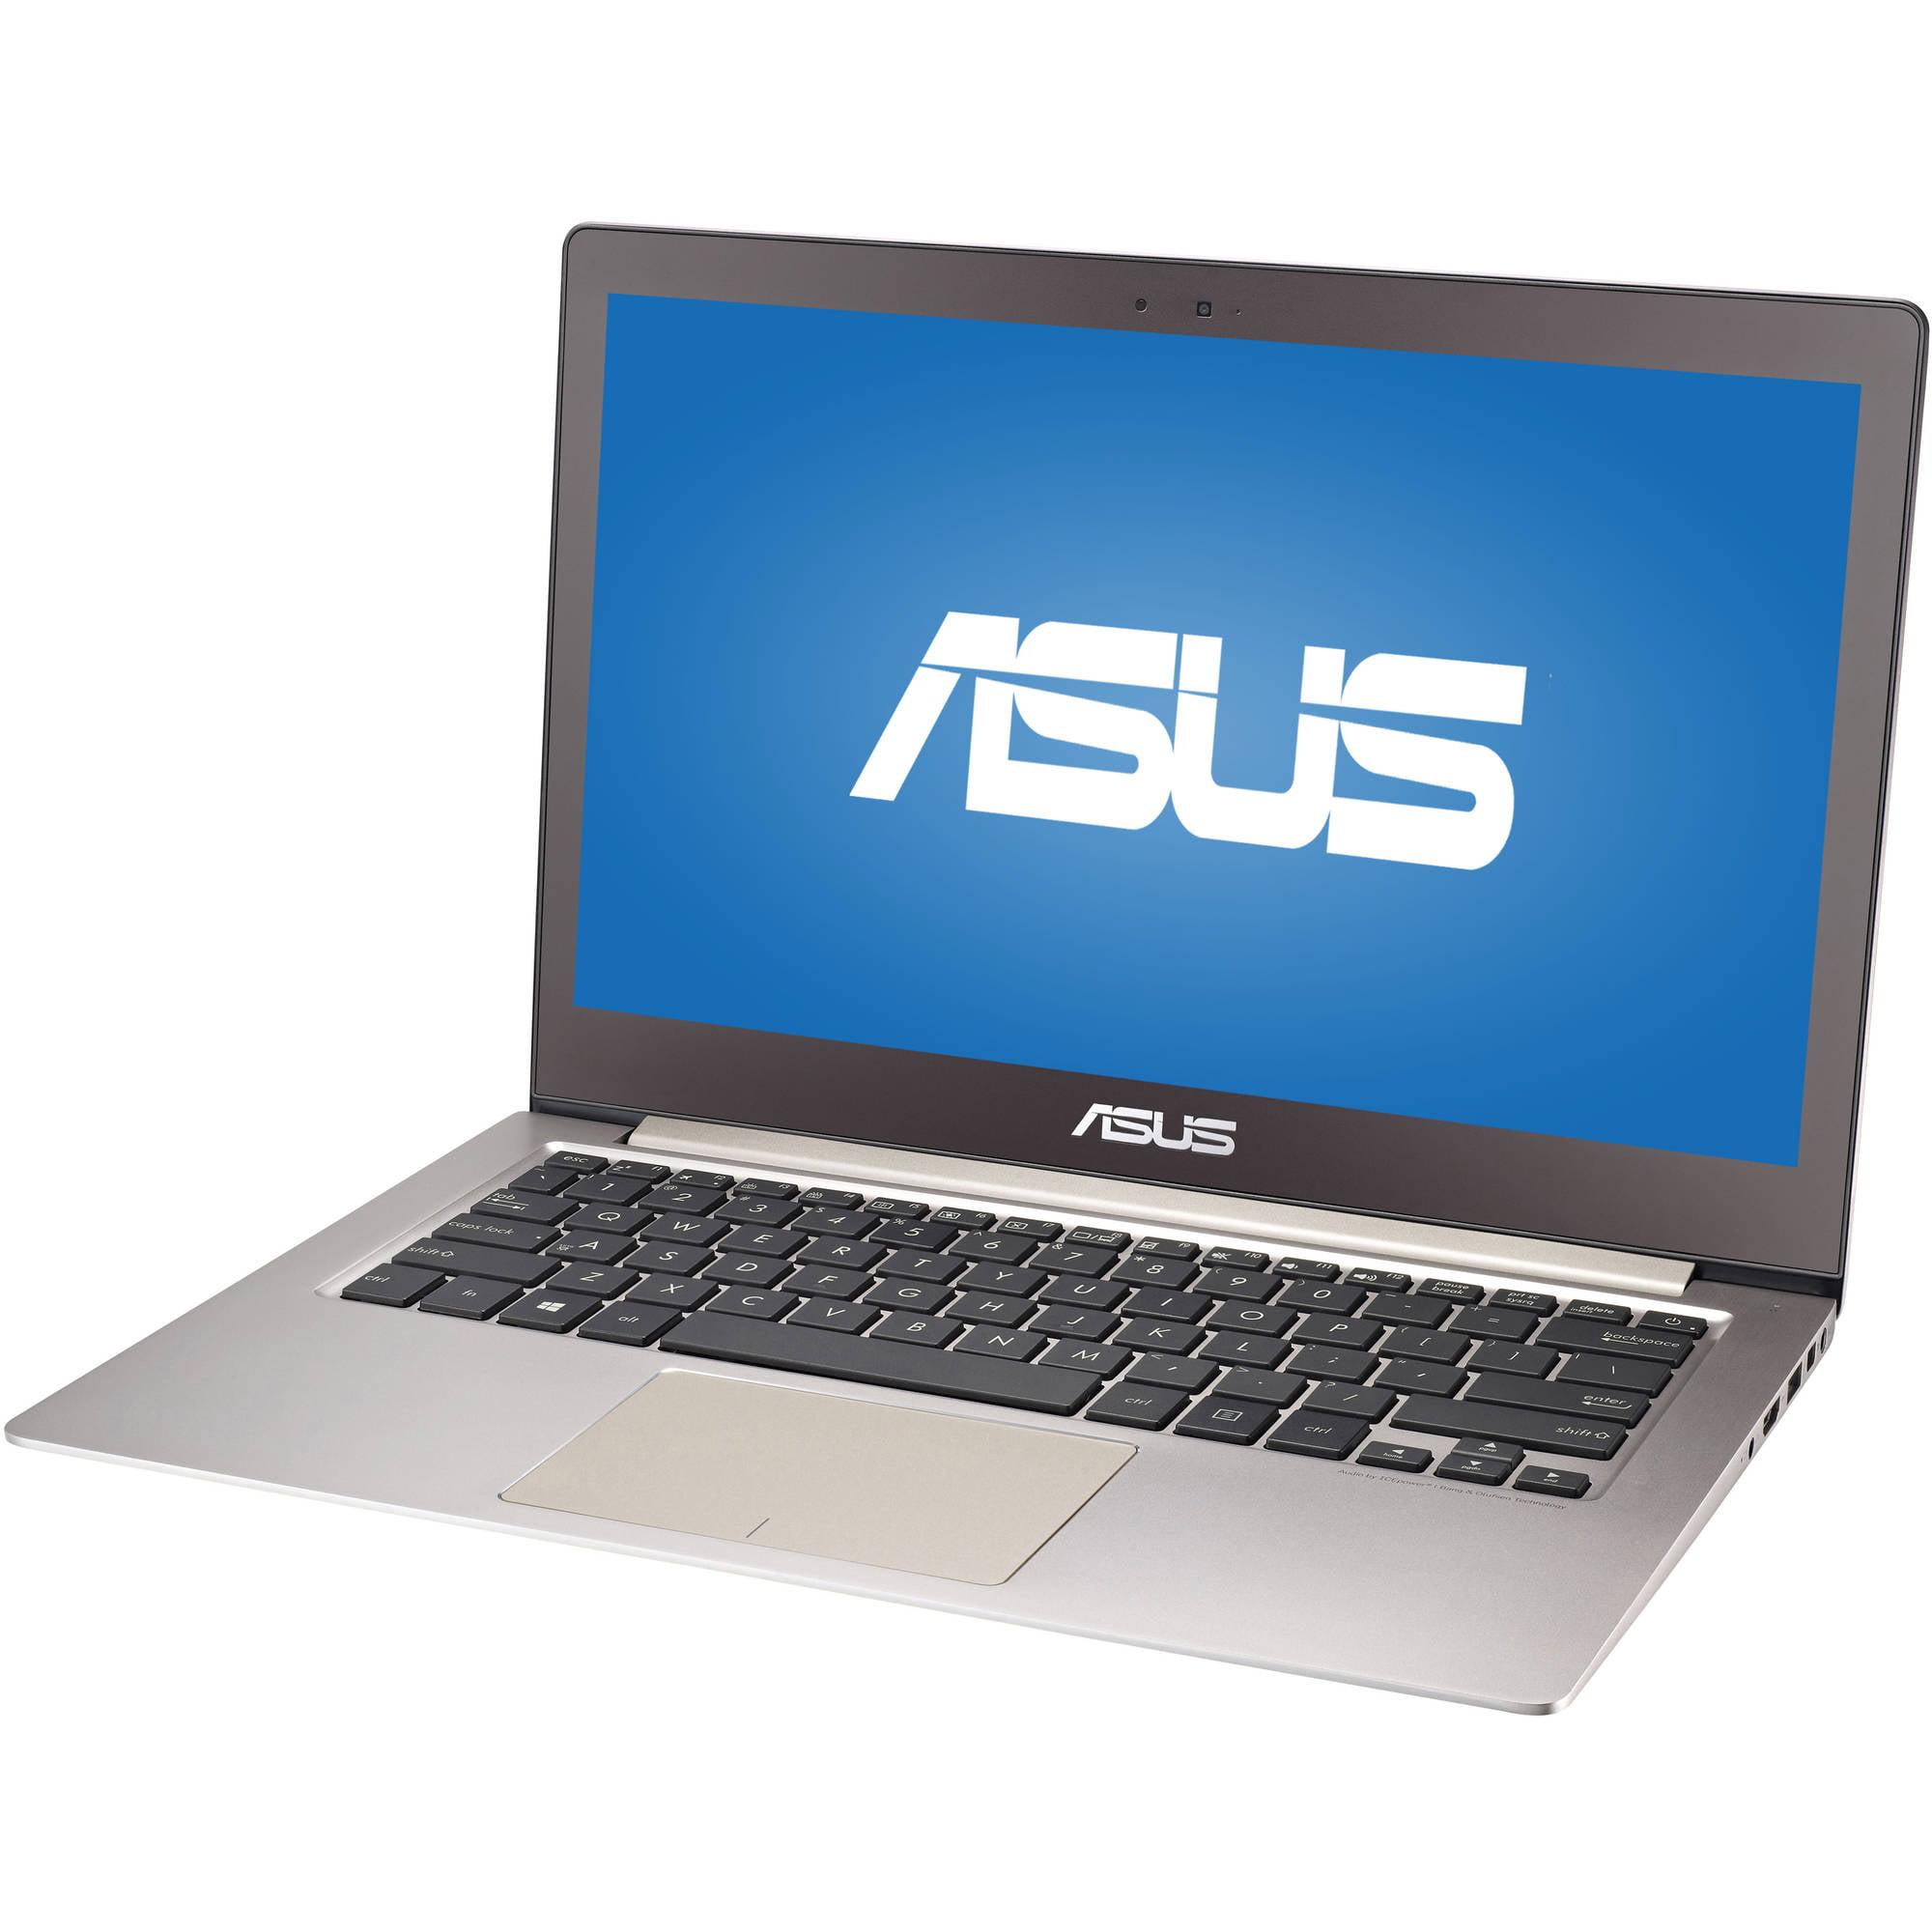 Asus UX303UA-YS51 I5-6200U 2.3G 4GB 128GB 13.3IN W10HOME ...